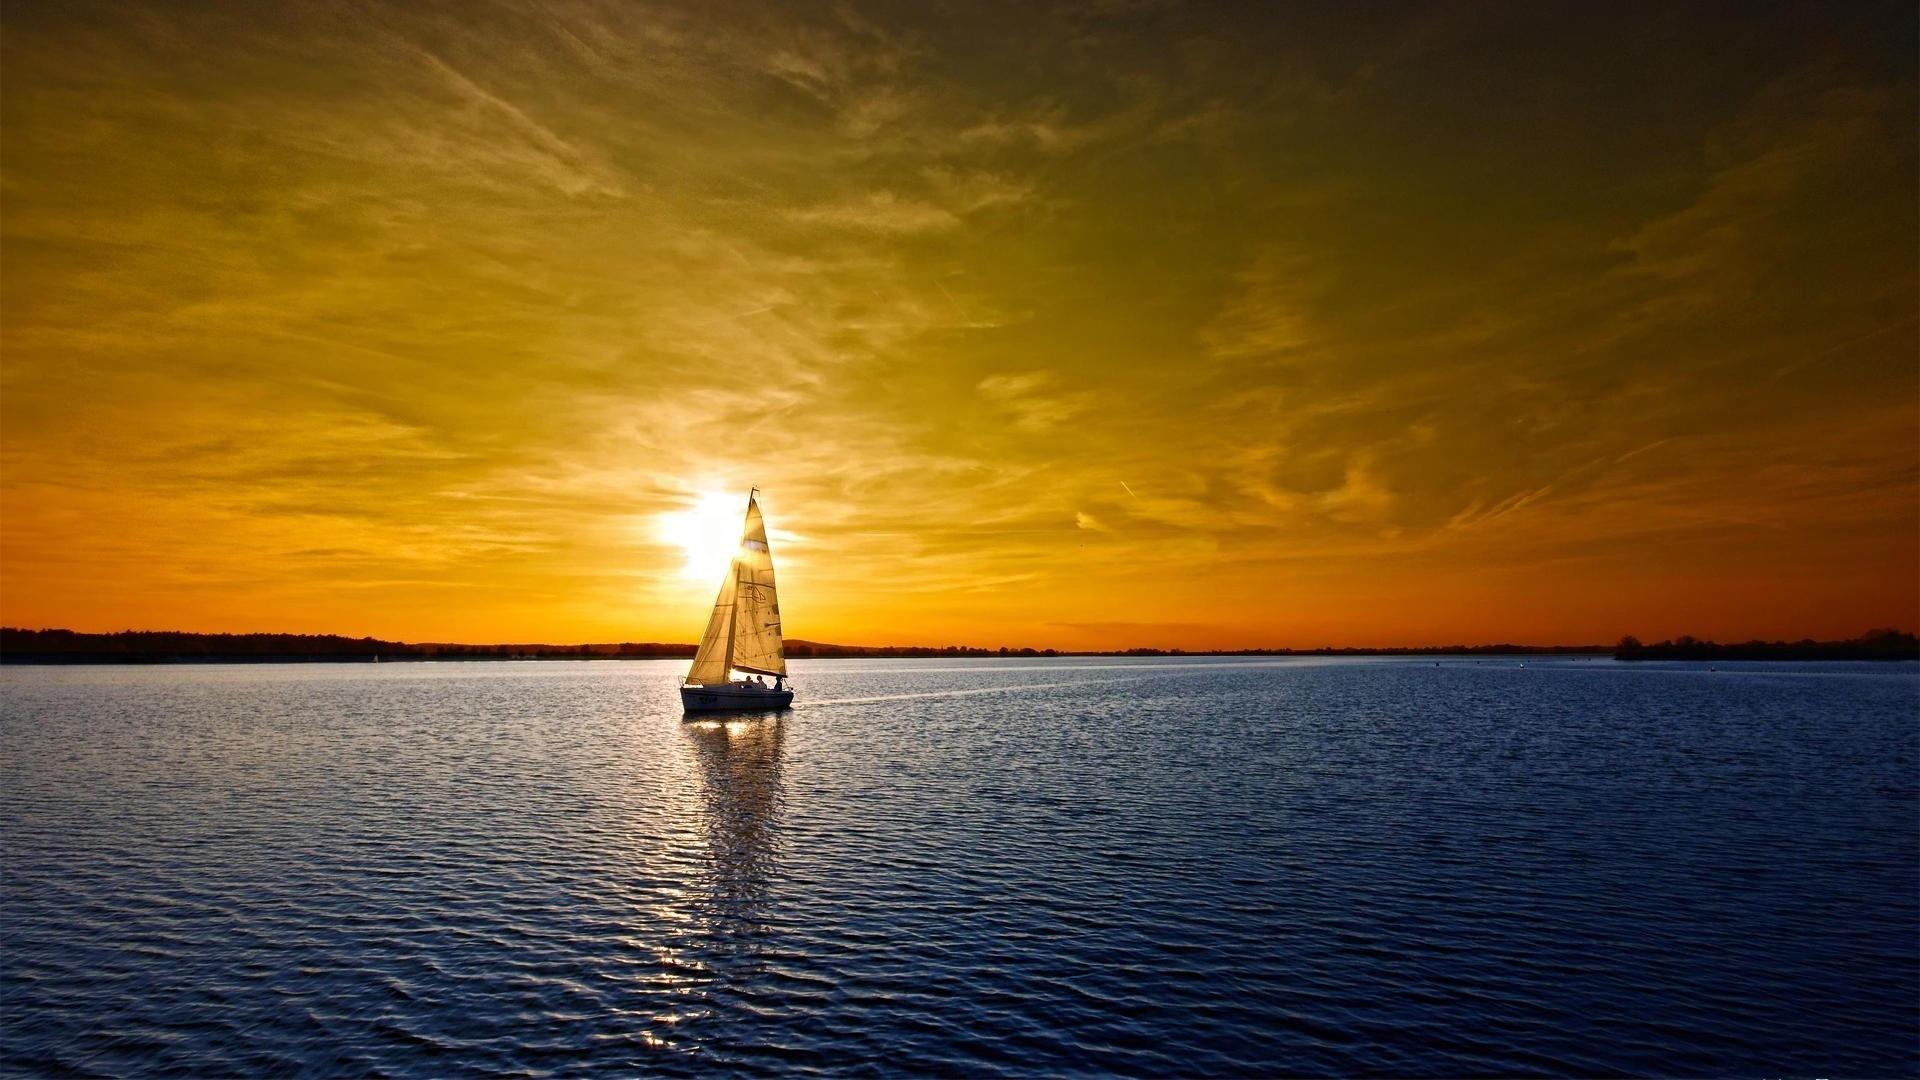 Res: 1920x1080, Beautiful ocean sunset wallpaper